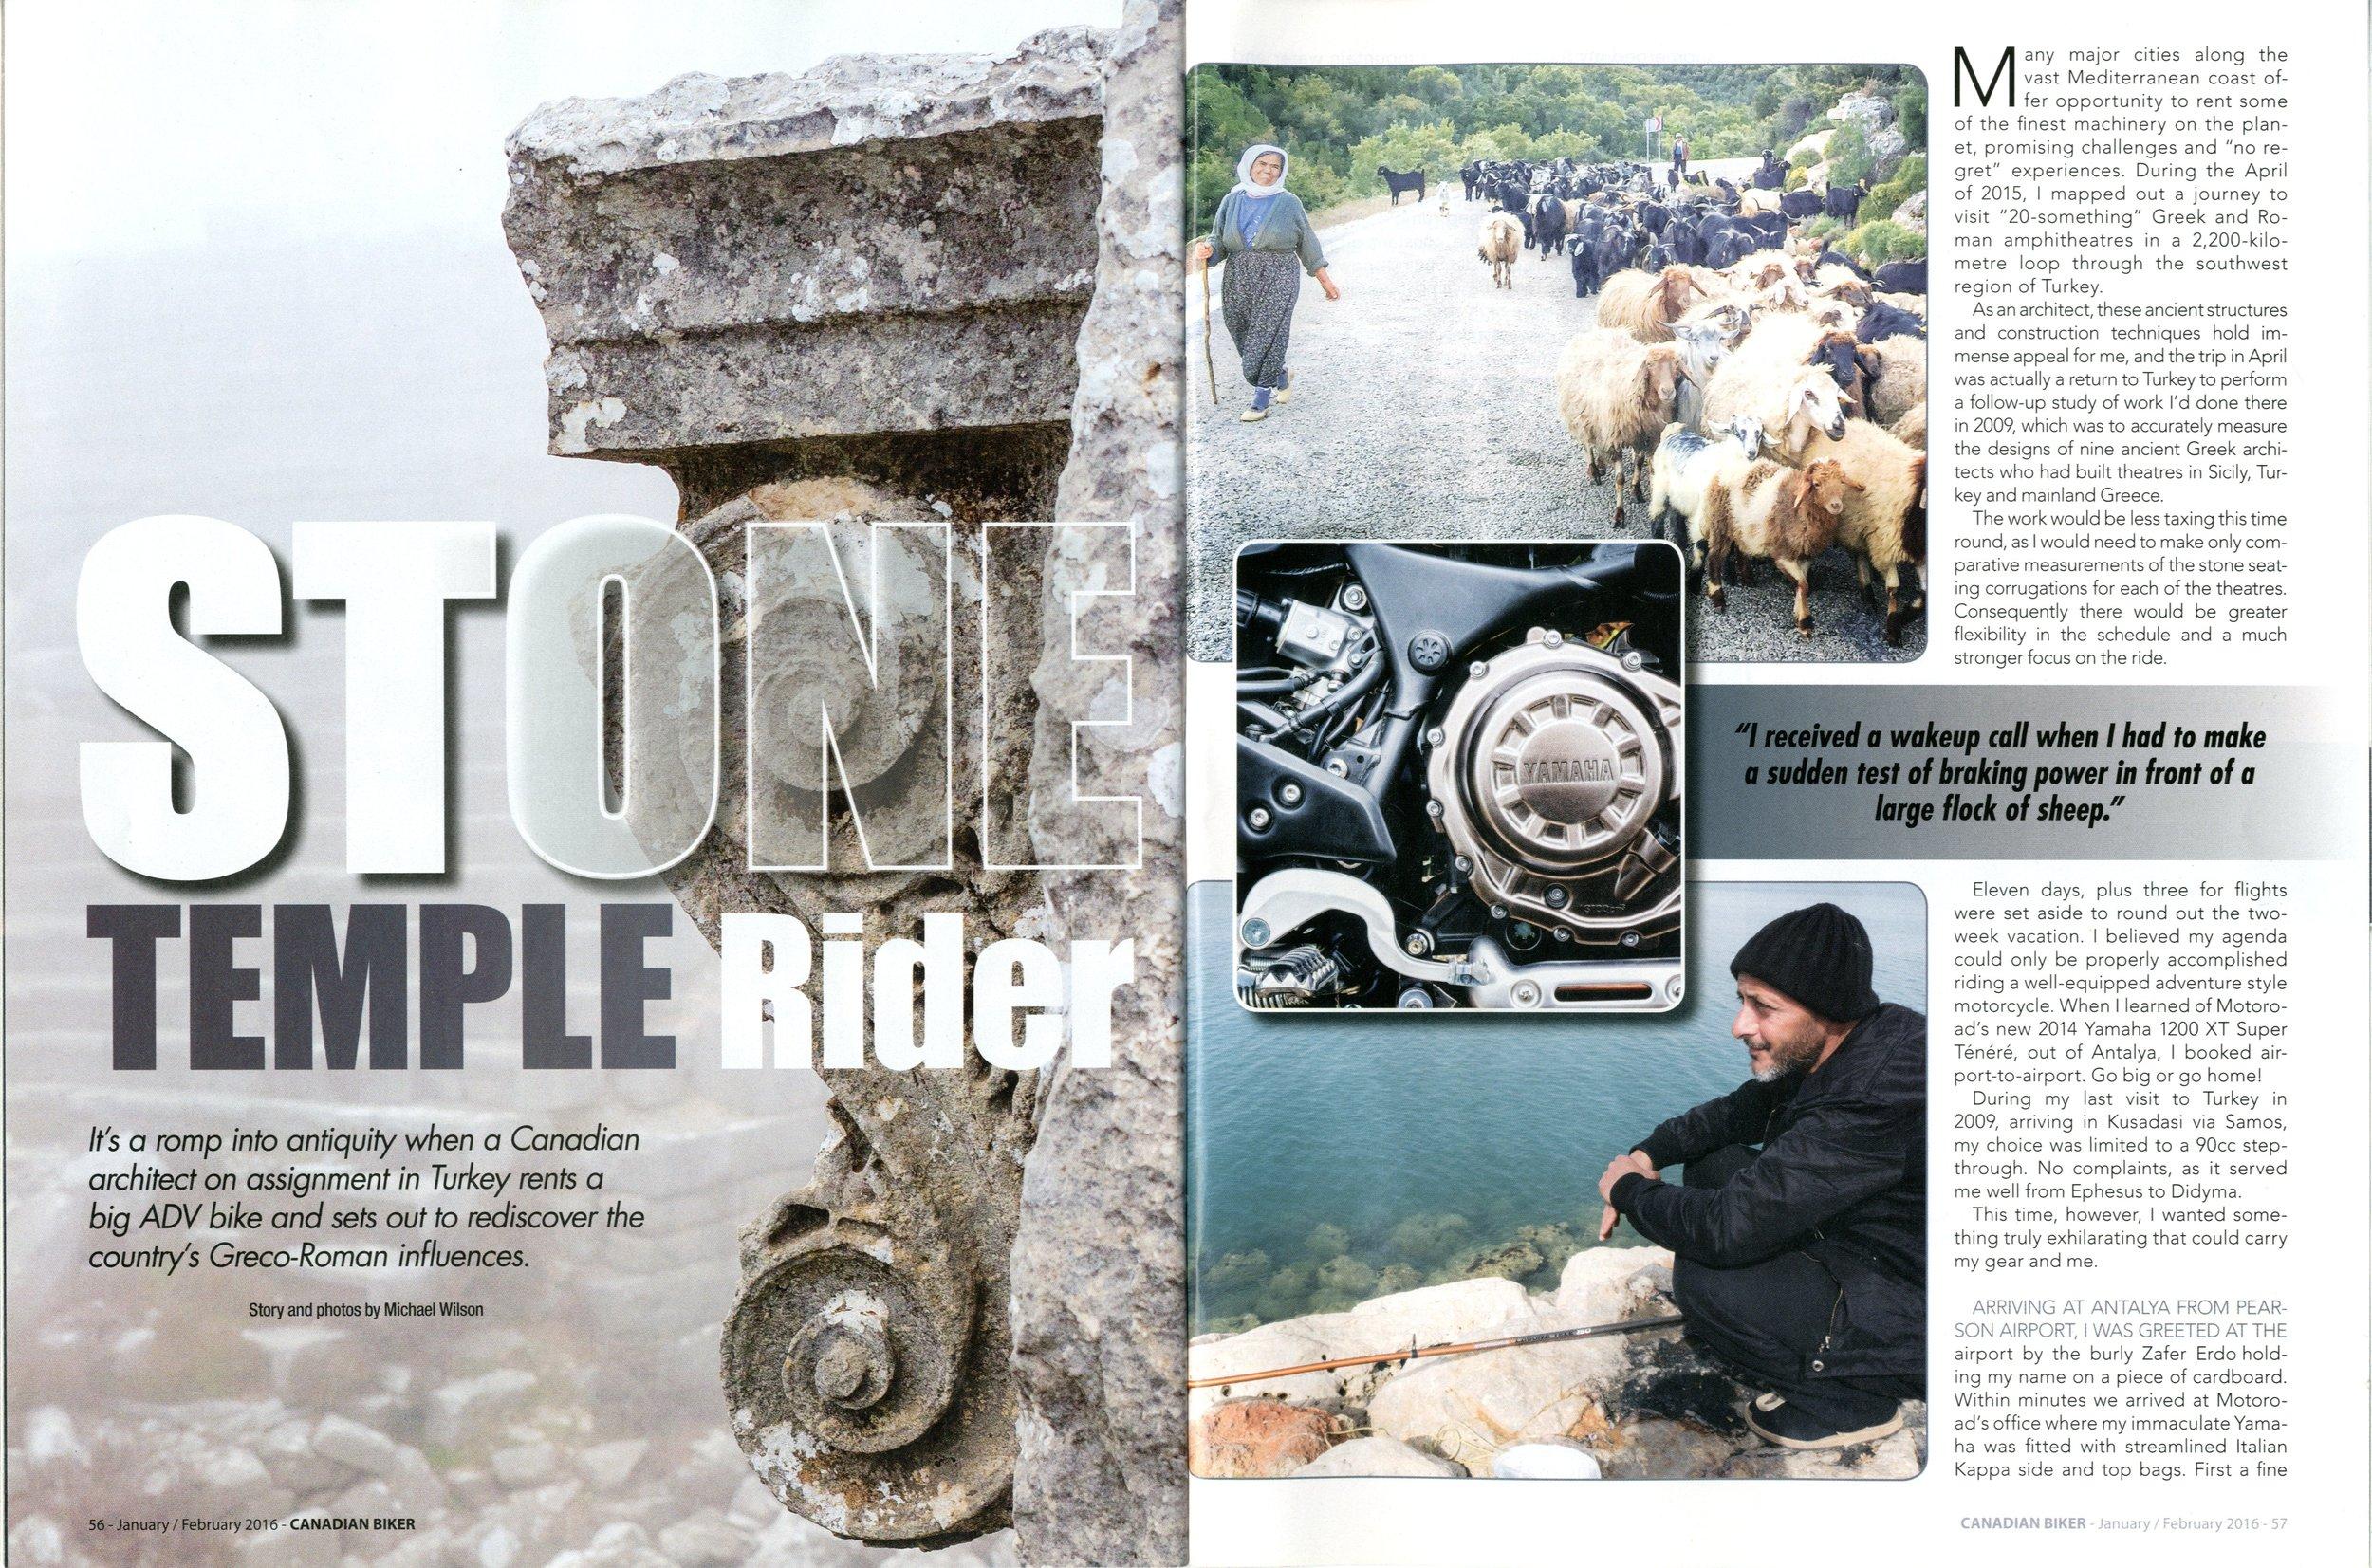 Stone Temple Rider004.jpg